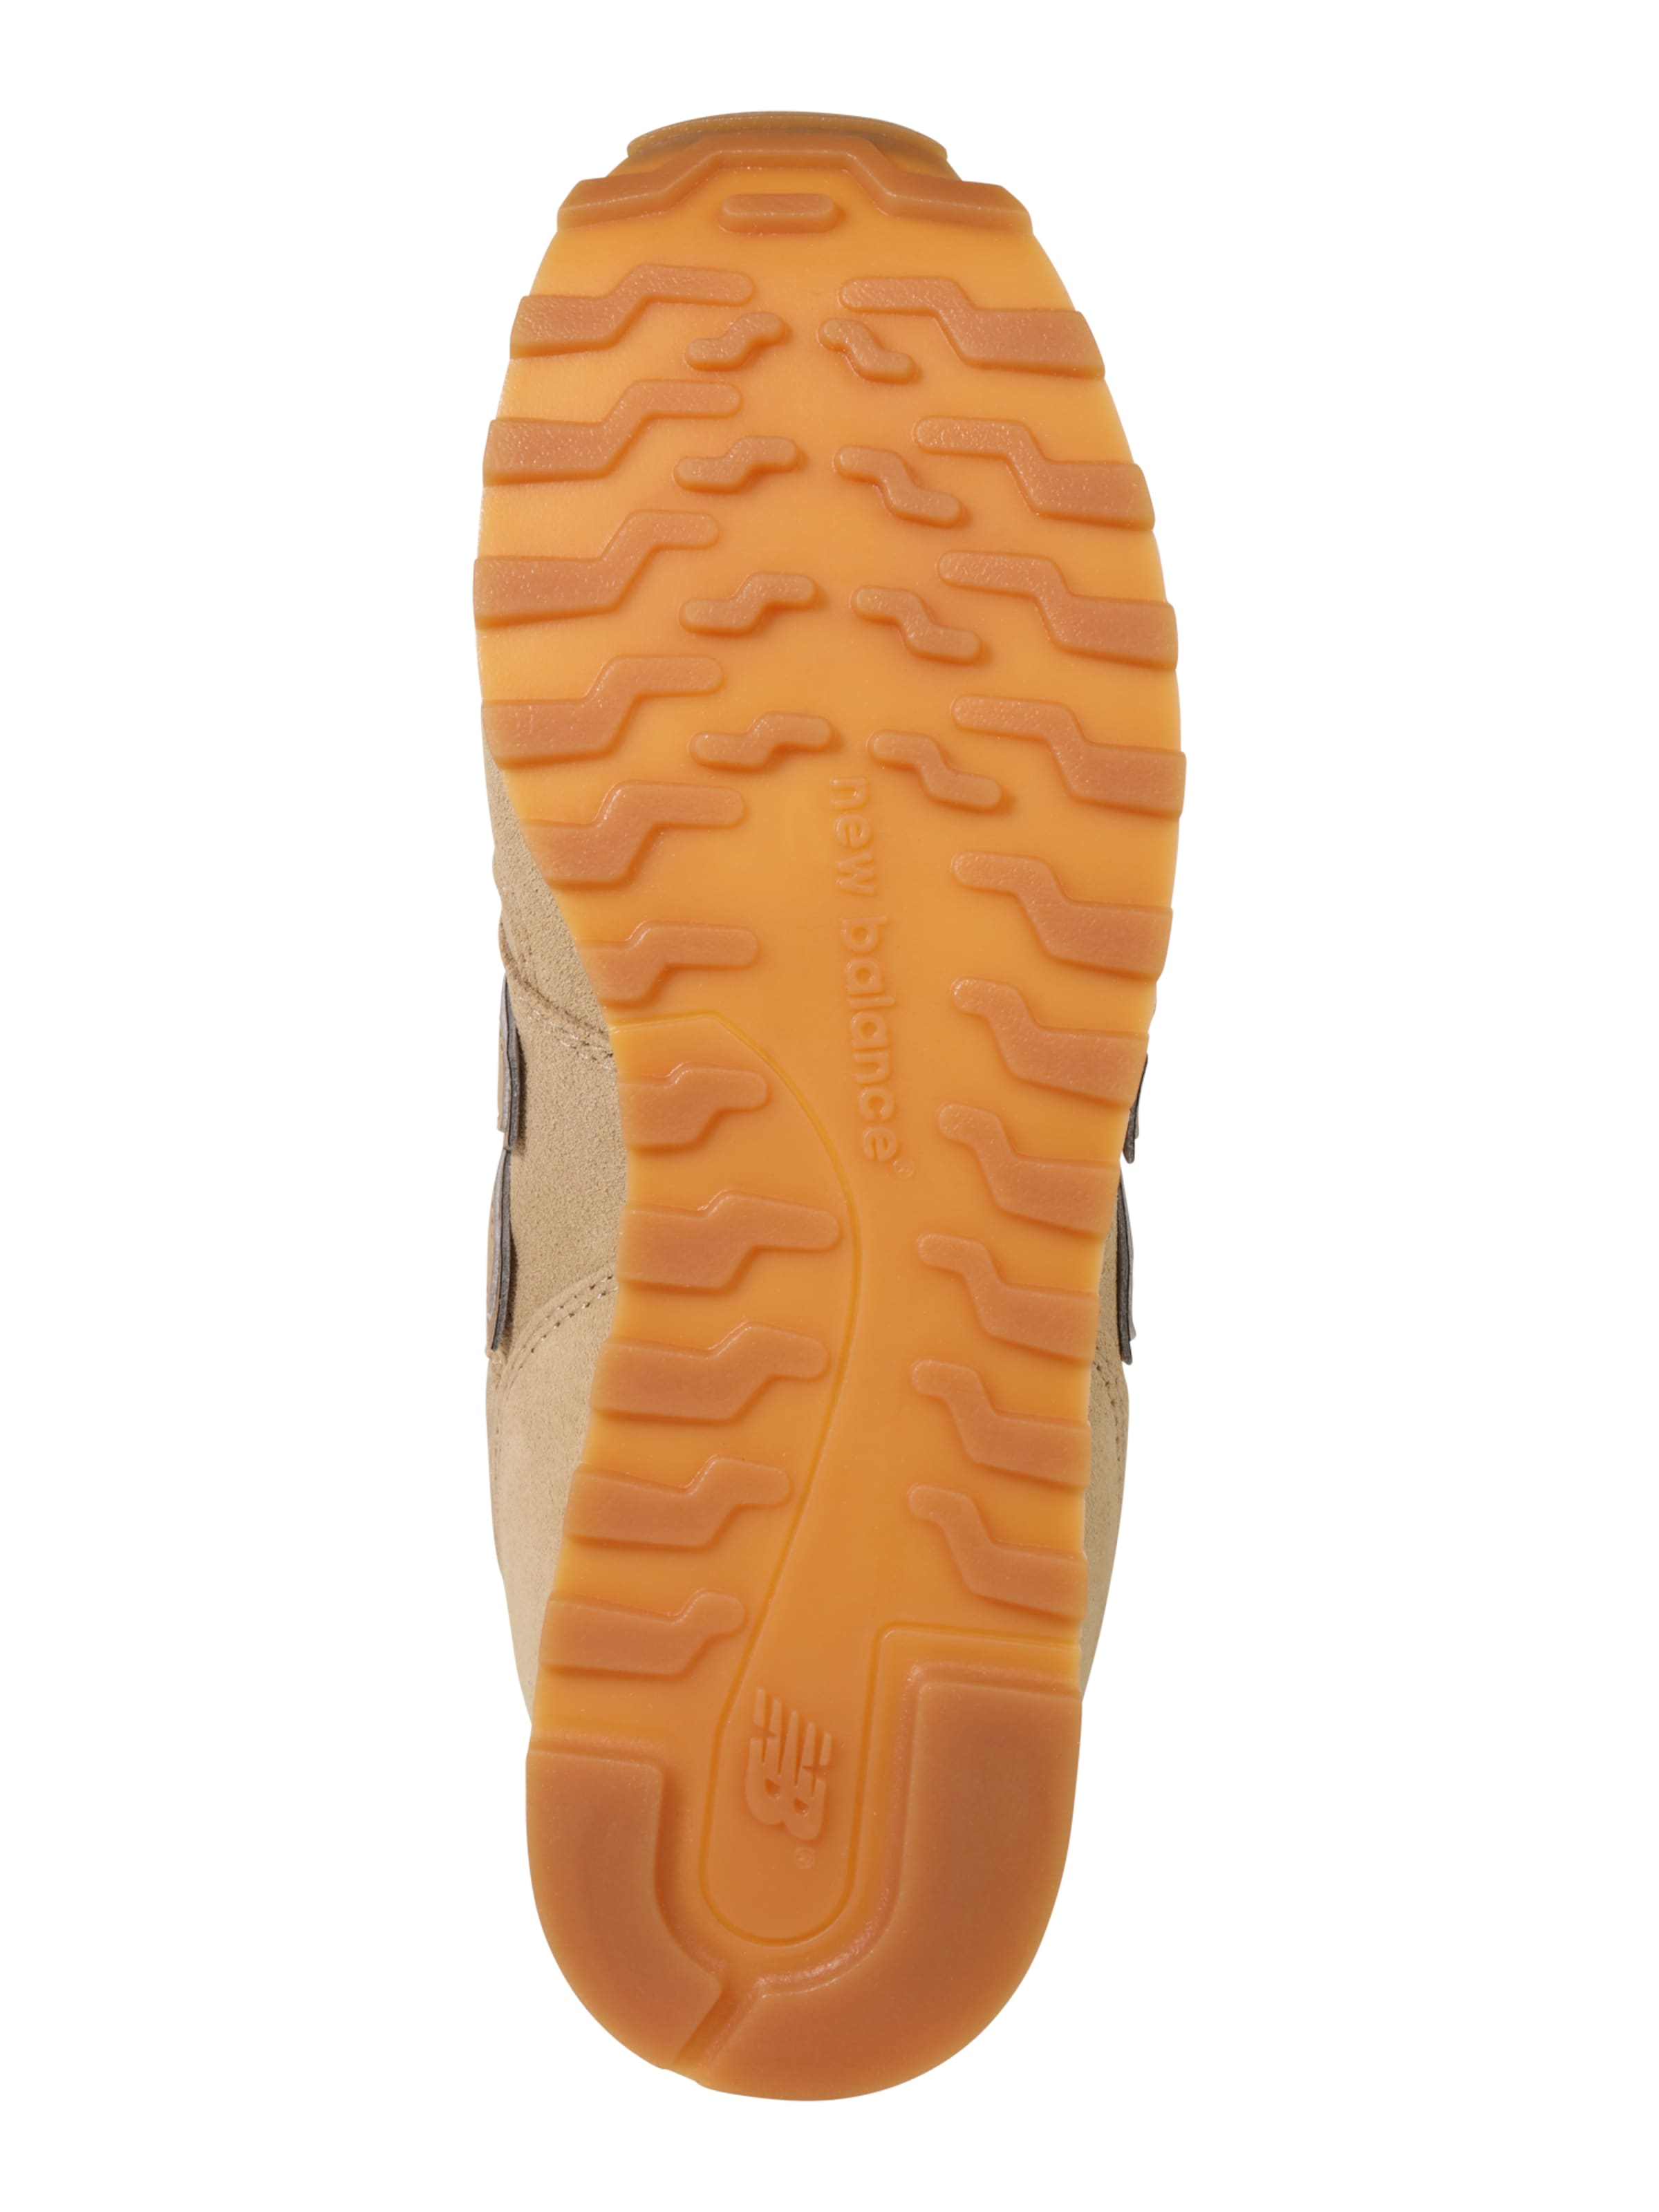 Balance New Sneaker In CremeHellbeige 'wl373' dCxoerB